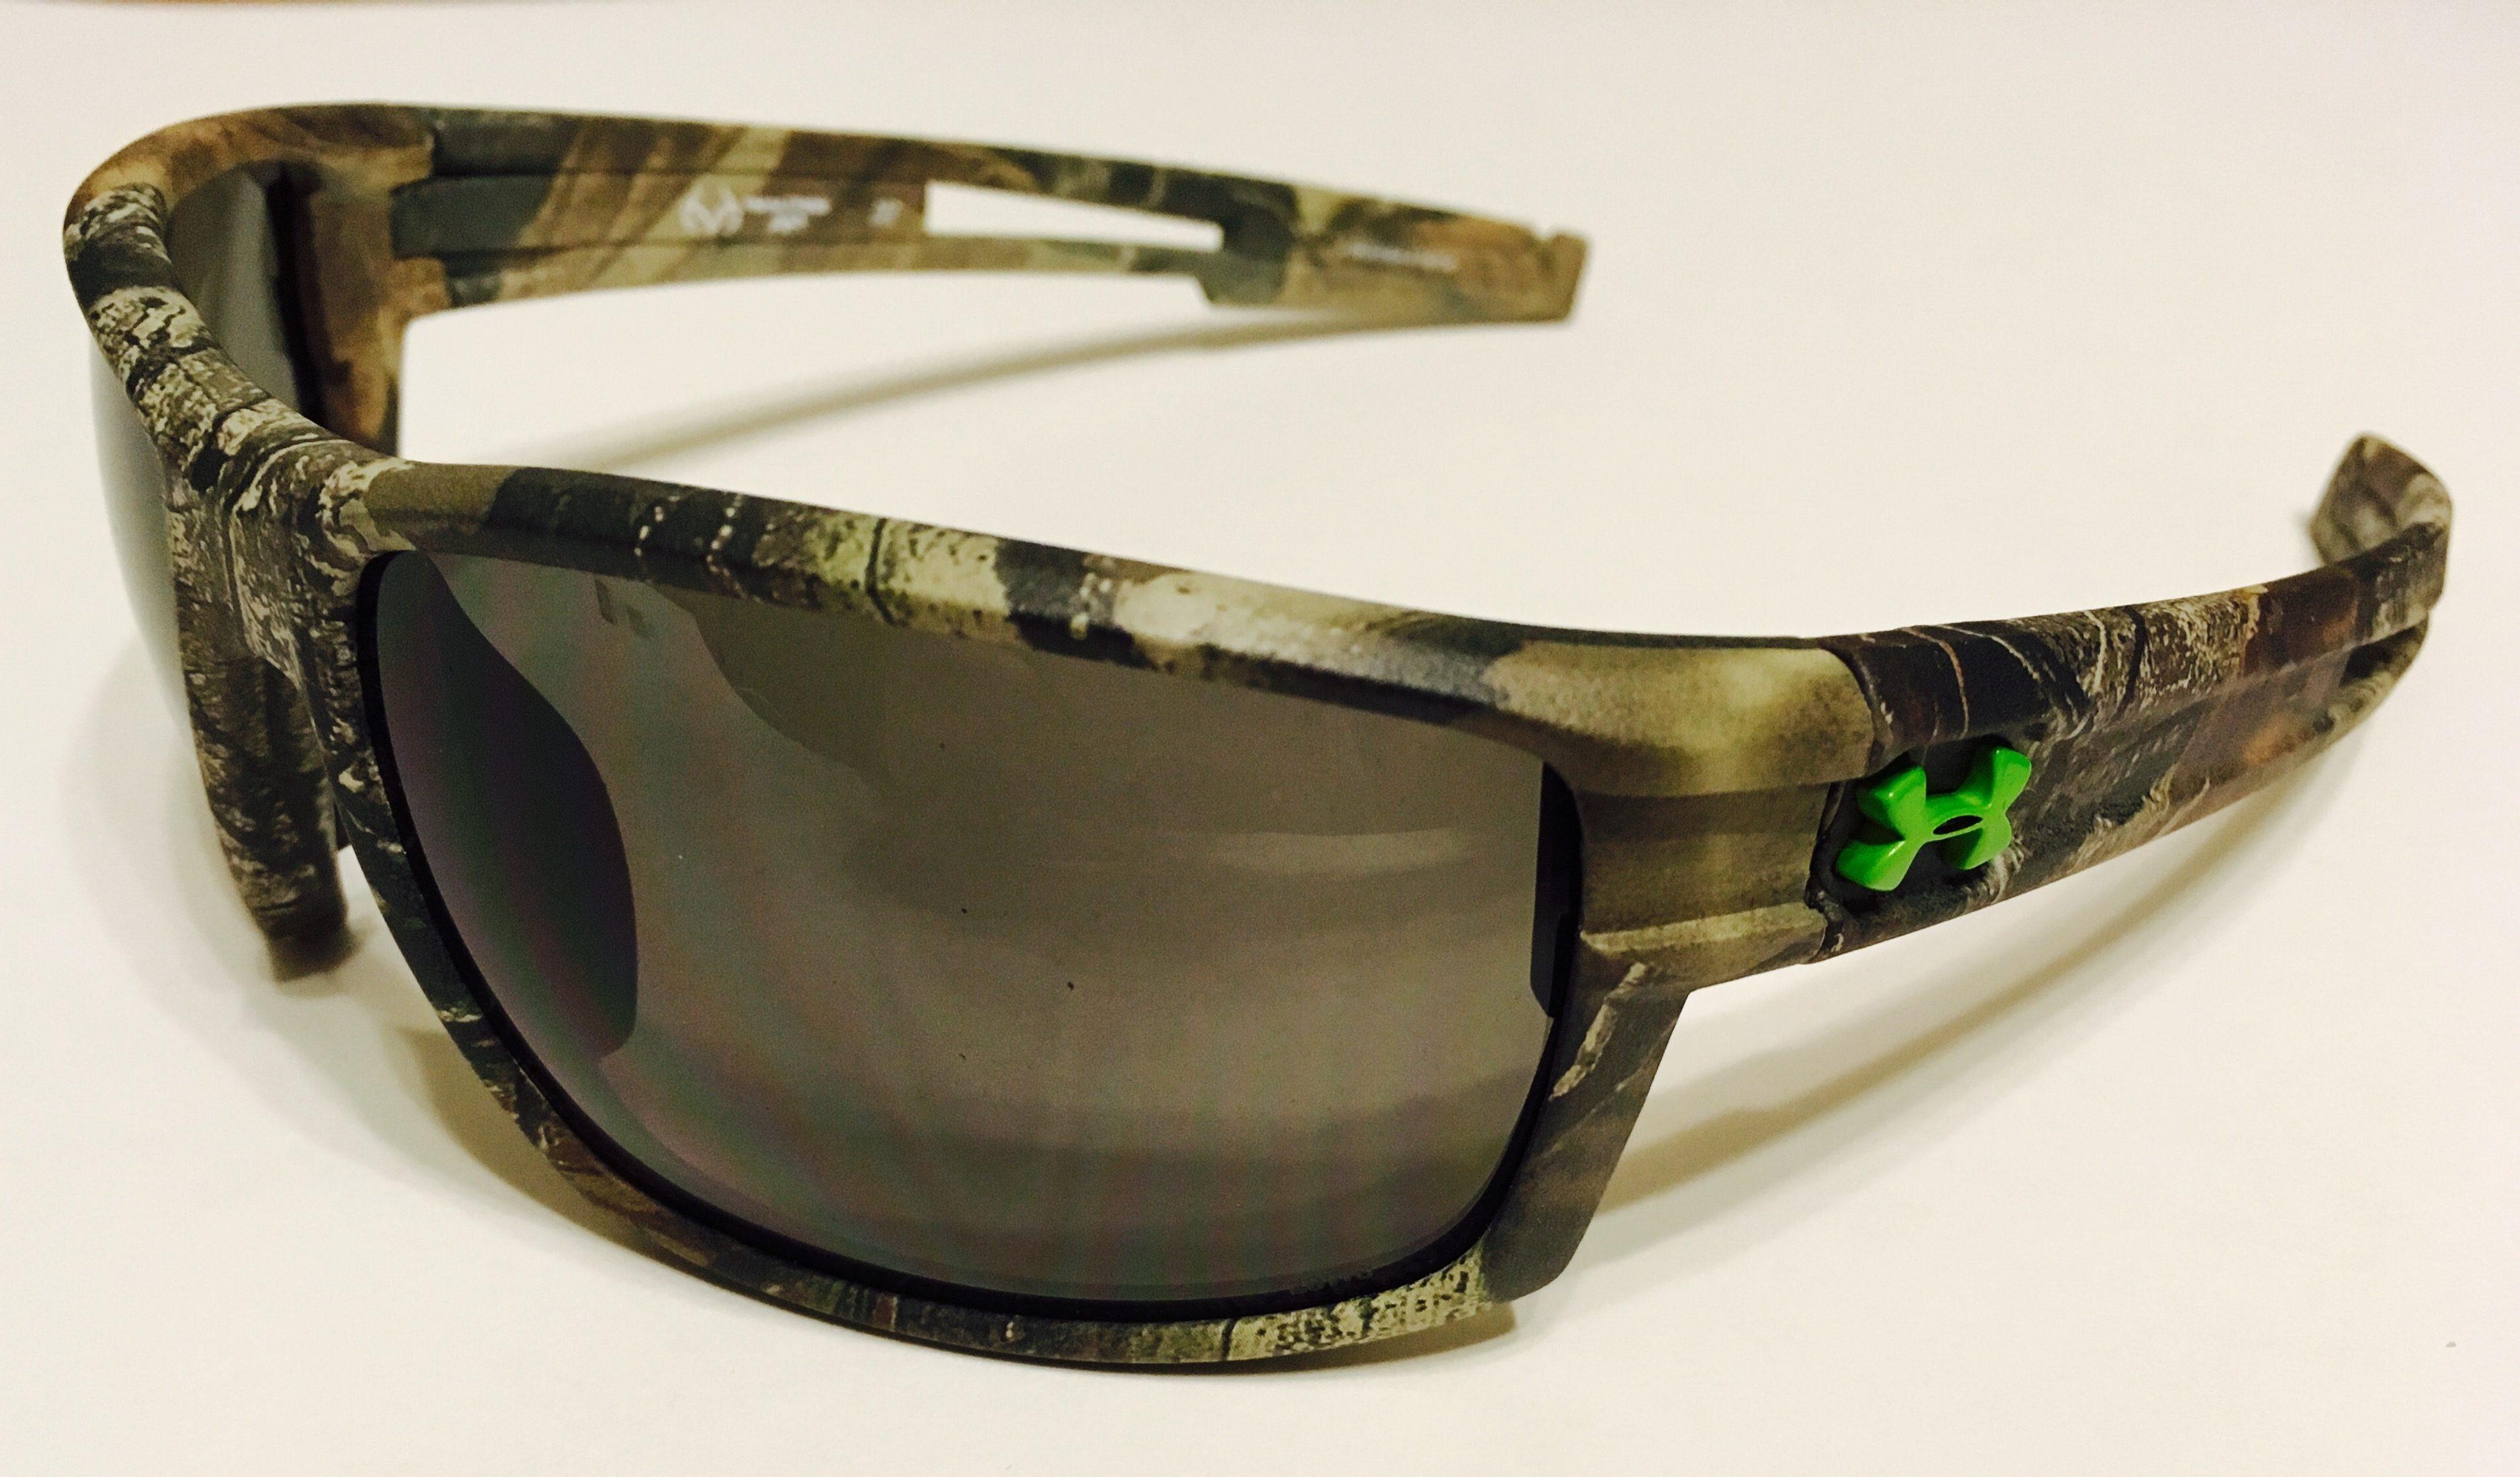 68fcc387b8 Under Armour Captain Sunglasses UA - Satin Camo Realtree - Gray ANSI Z87.1